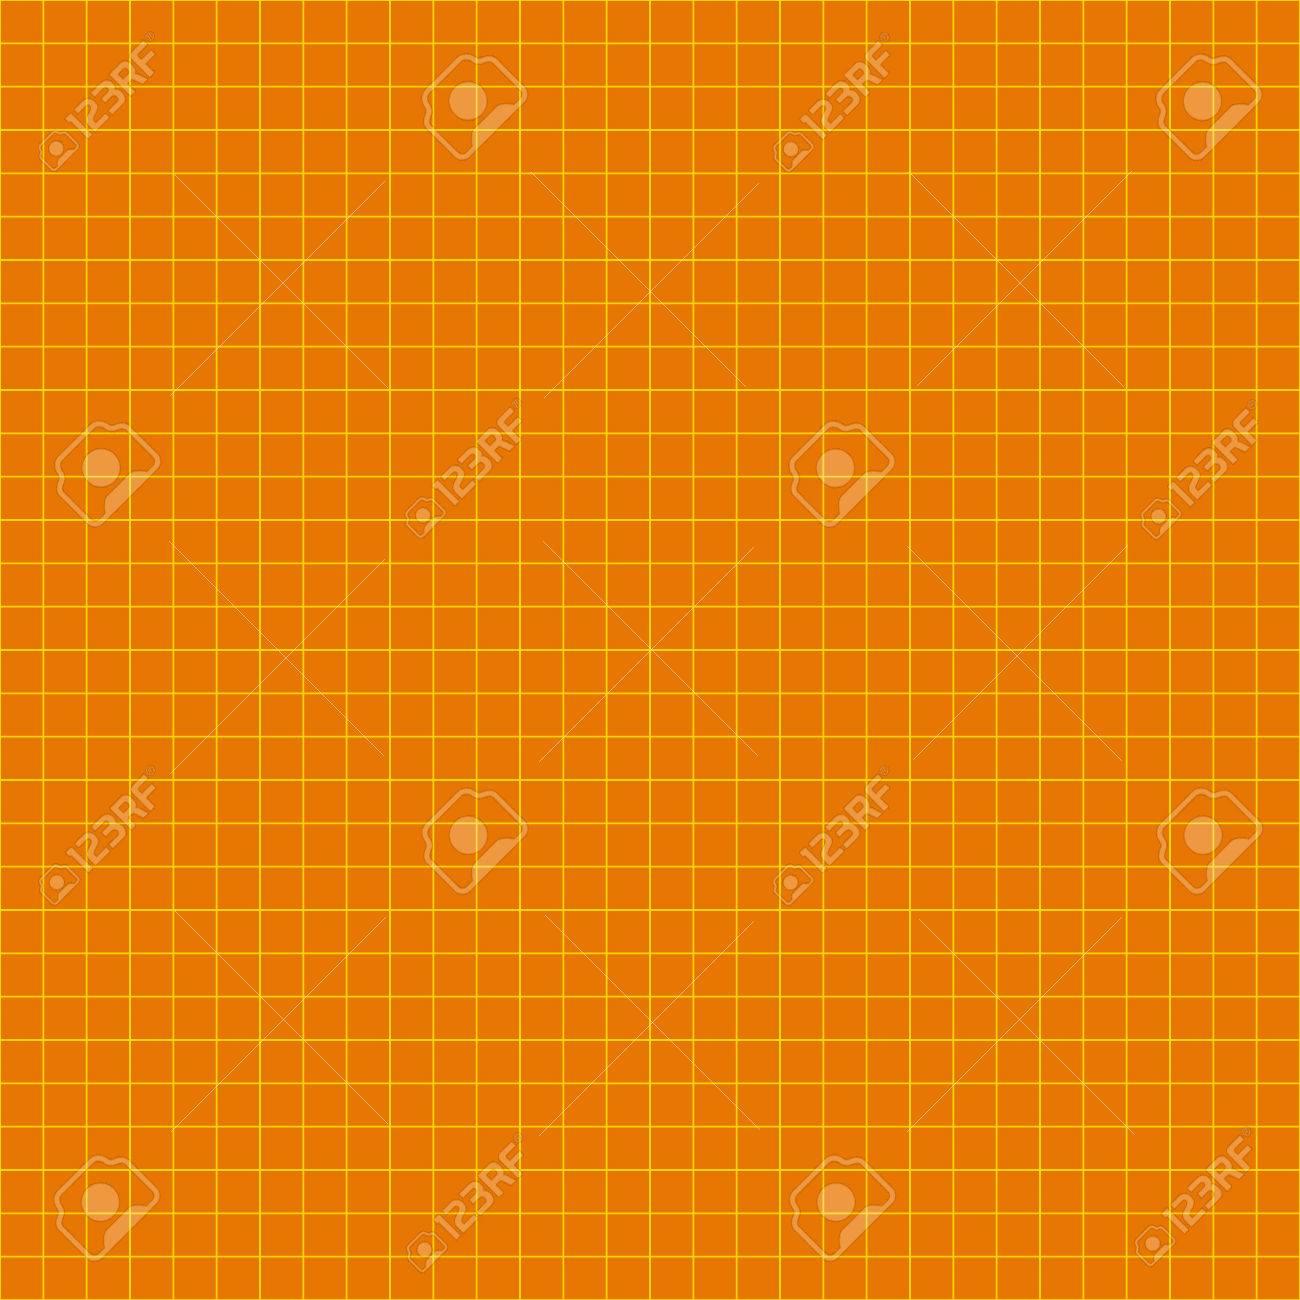 repeatable grid mesh pattern graph paper millimeter paper